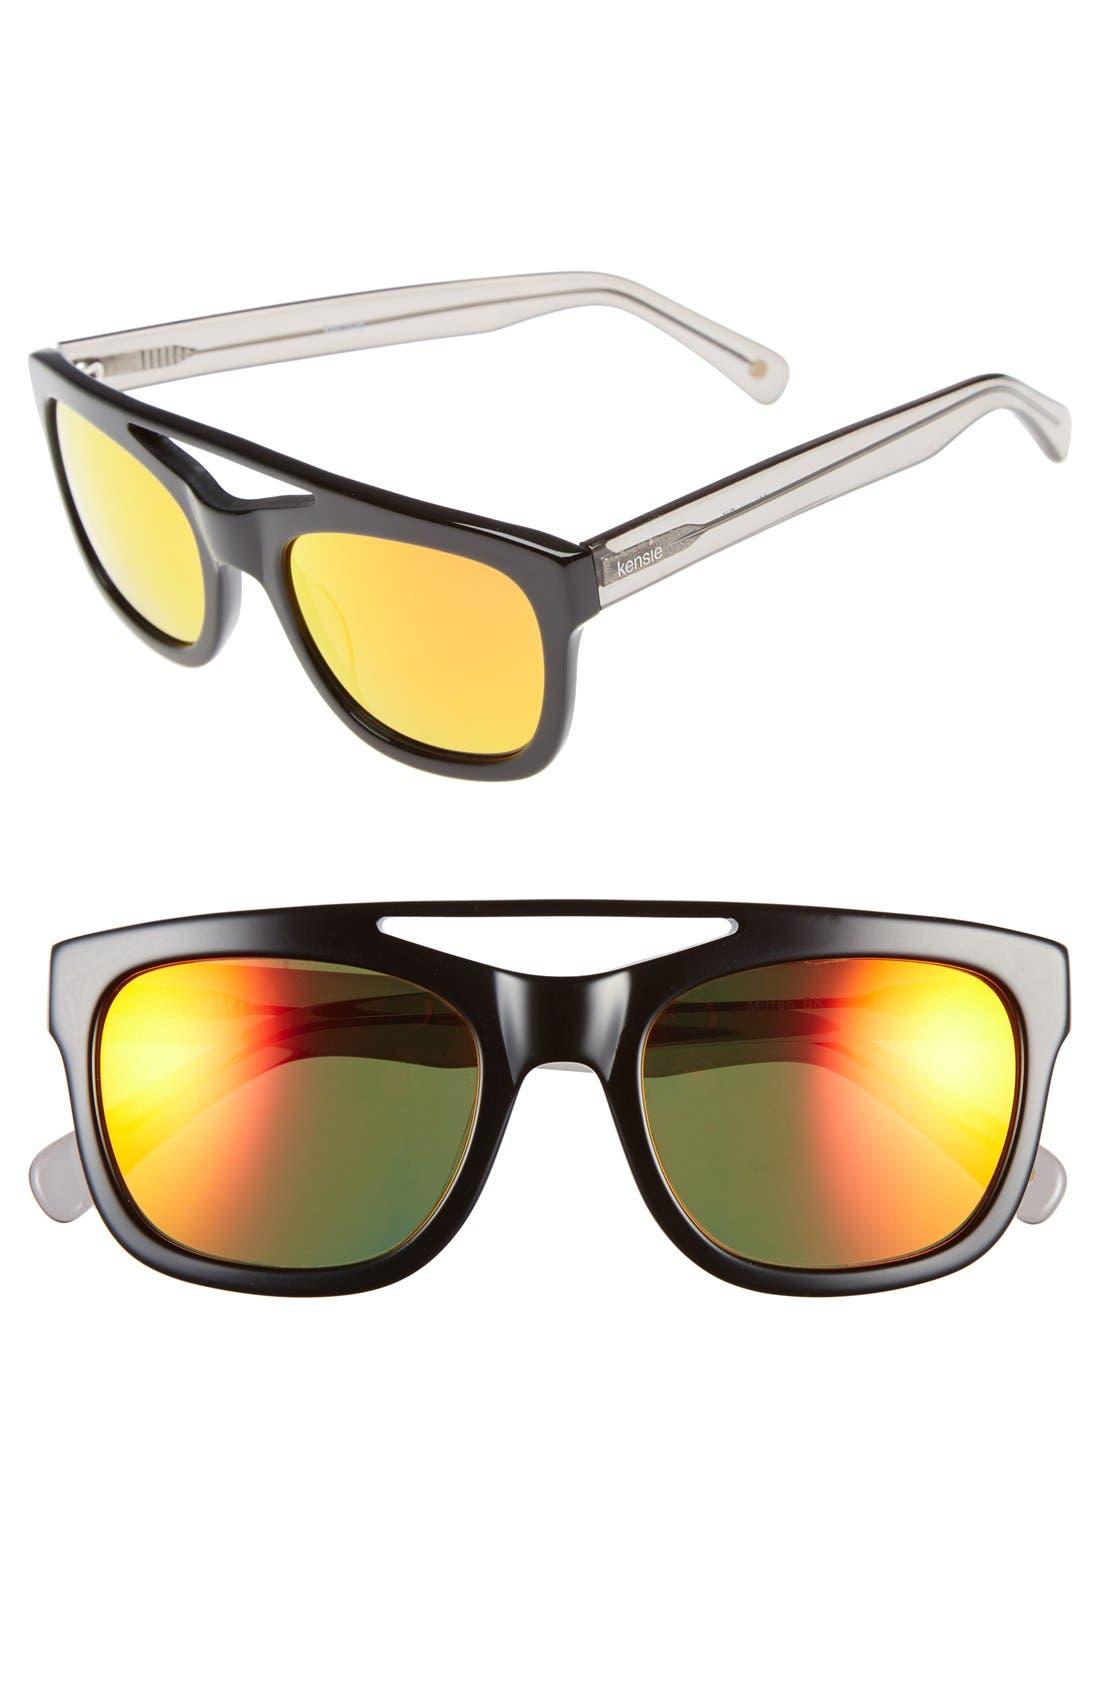 Alternate Image 1 Selected - kensie 'Mirren' 52mm Aviator Sunglasses